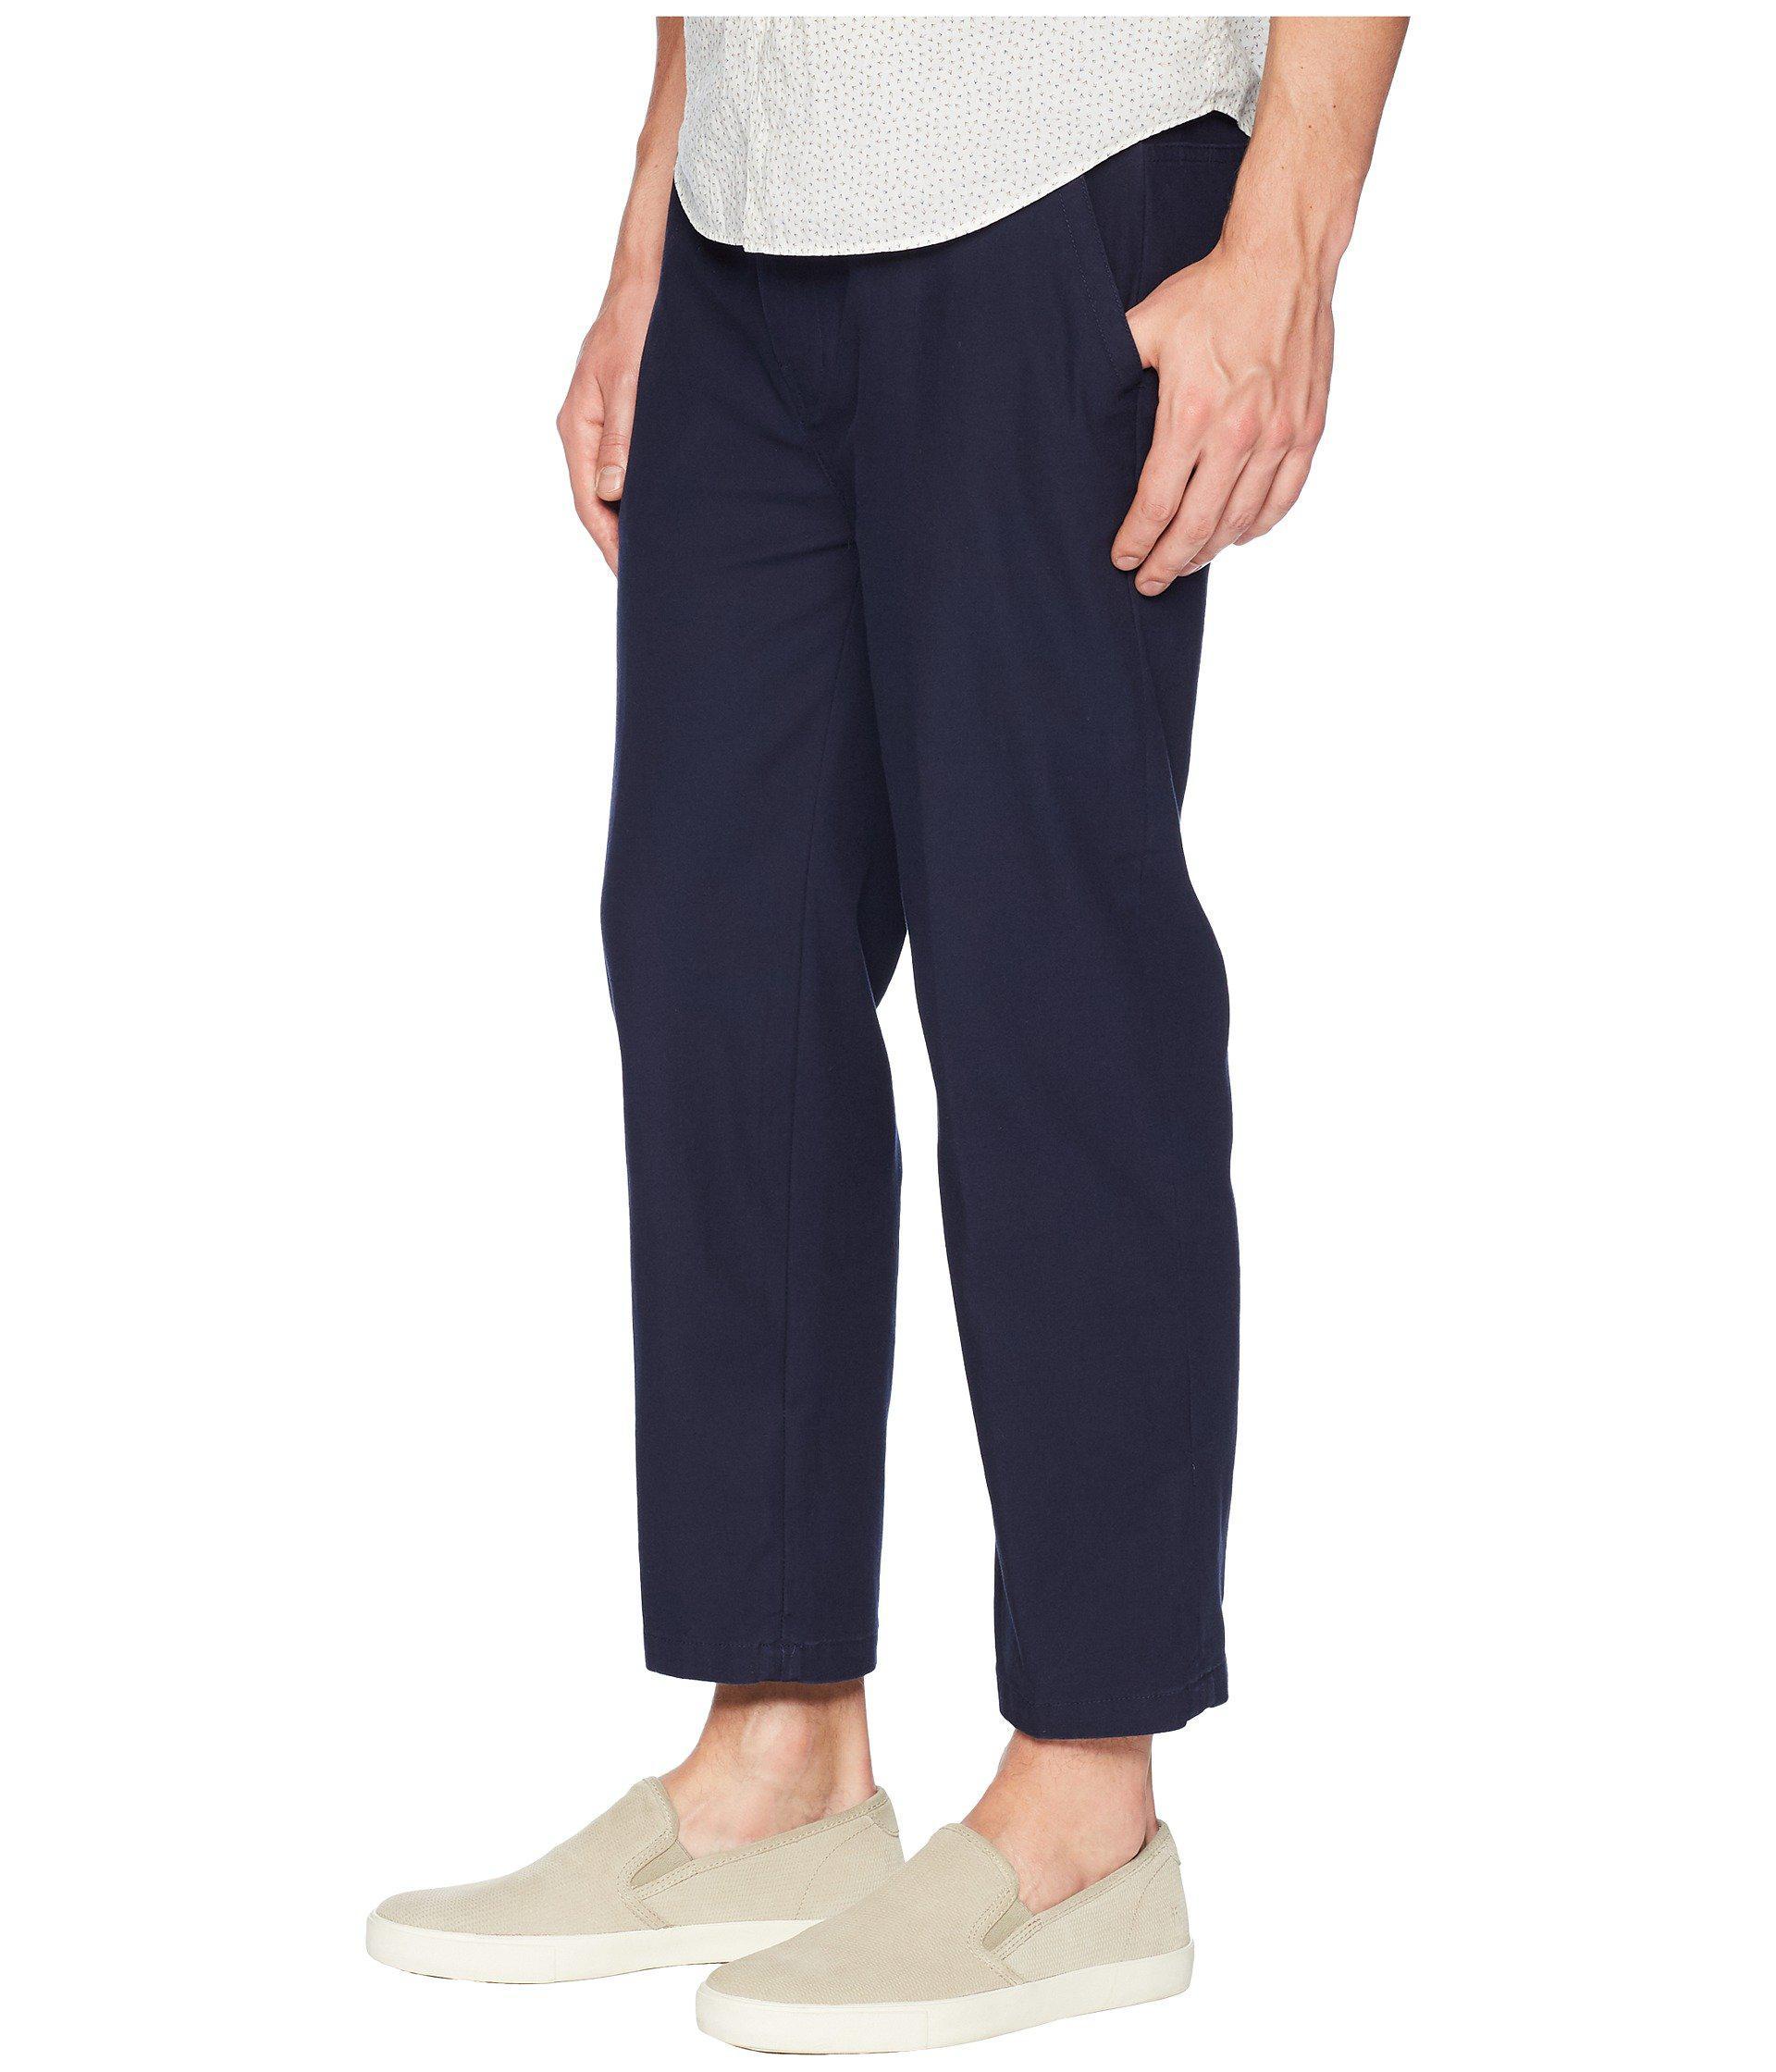 854175b09a Lyst - Globe Dion Slider Pants in Blue for Men - Save 22%